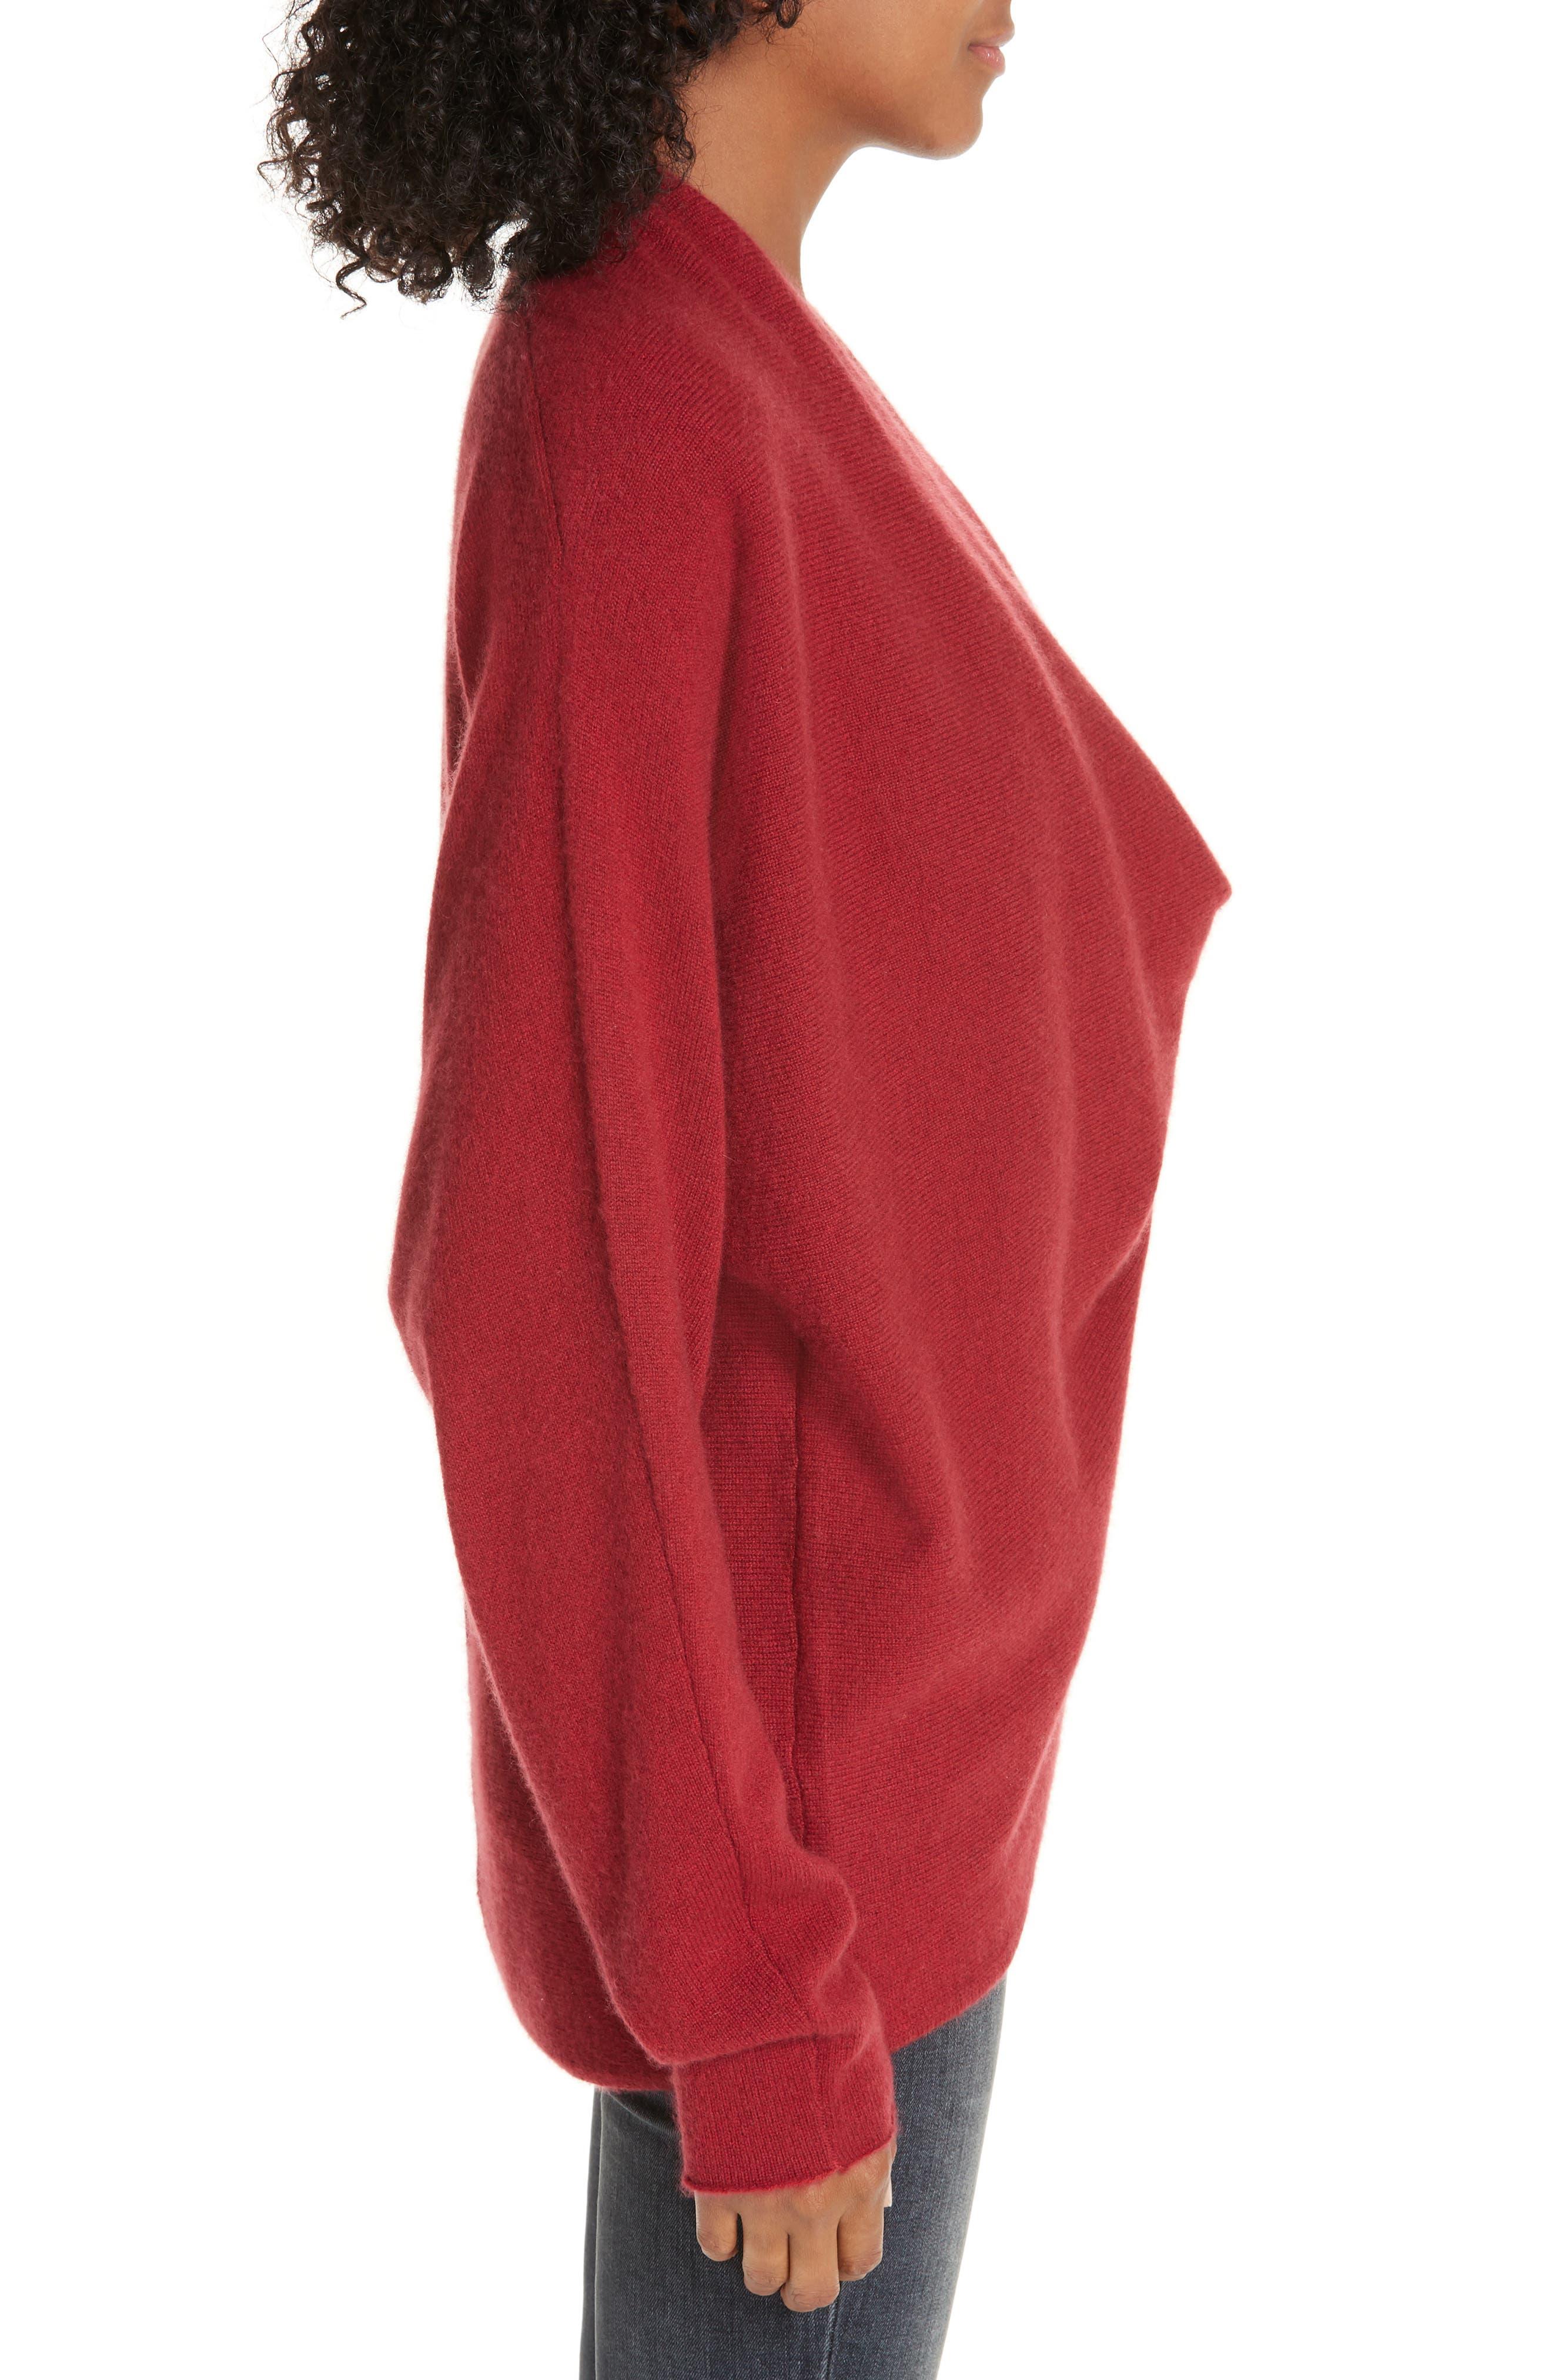 BROCHU WALKER,                             Clea Cashmere Wrap Sweater,                             Alternate thumbnail 3, color,                             TANGIER